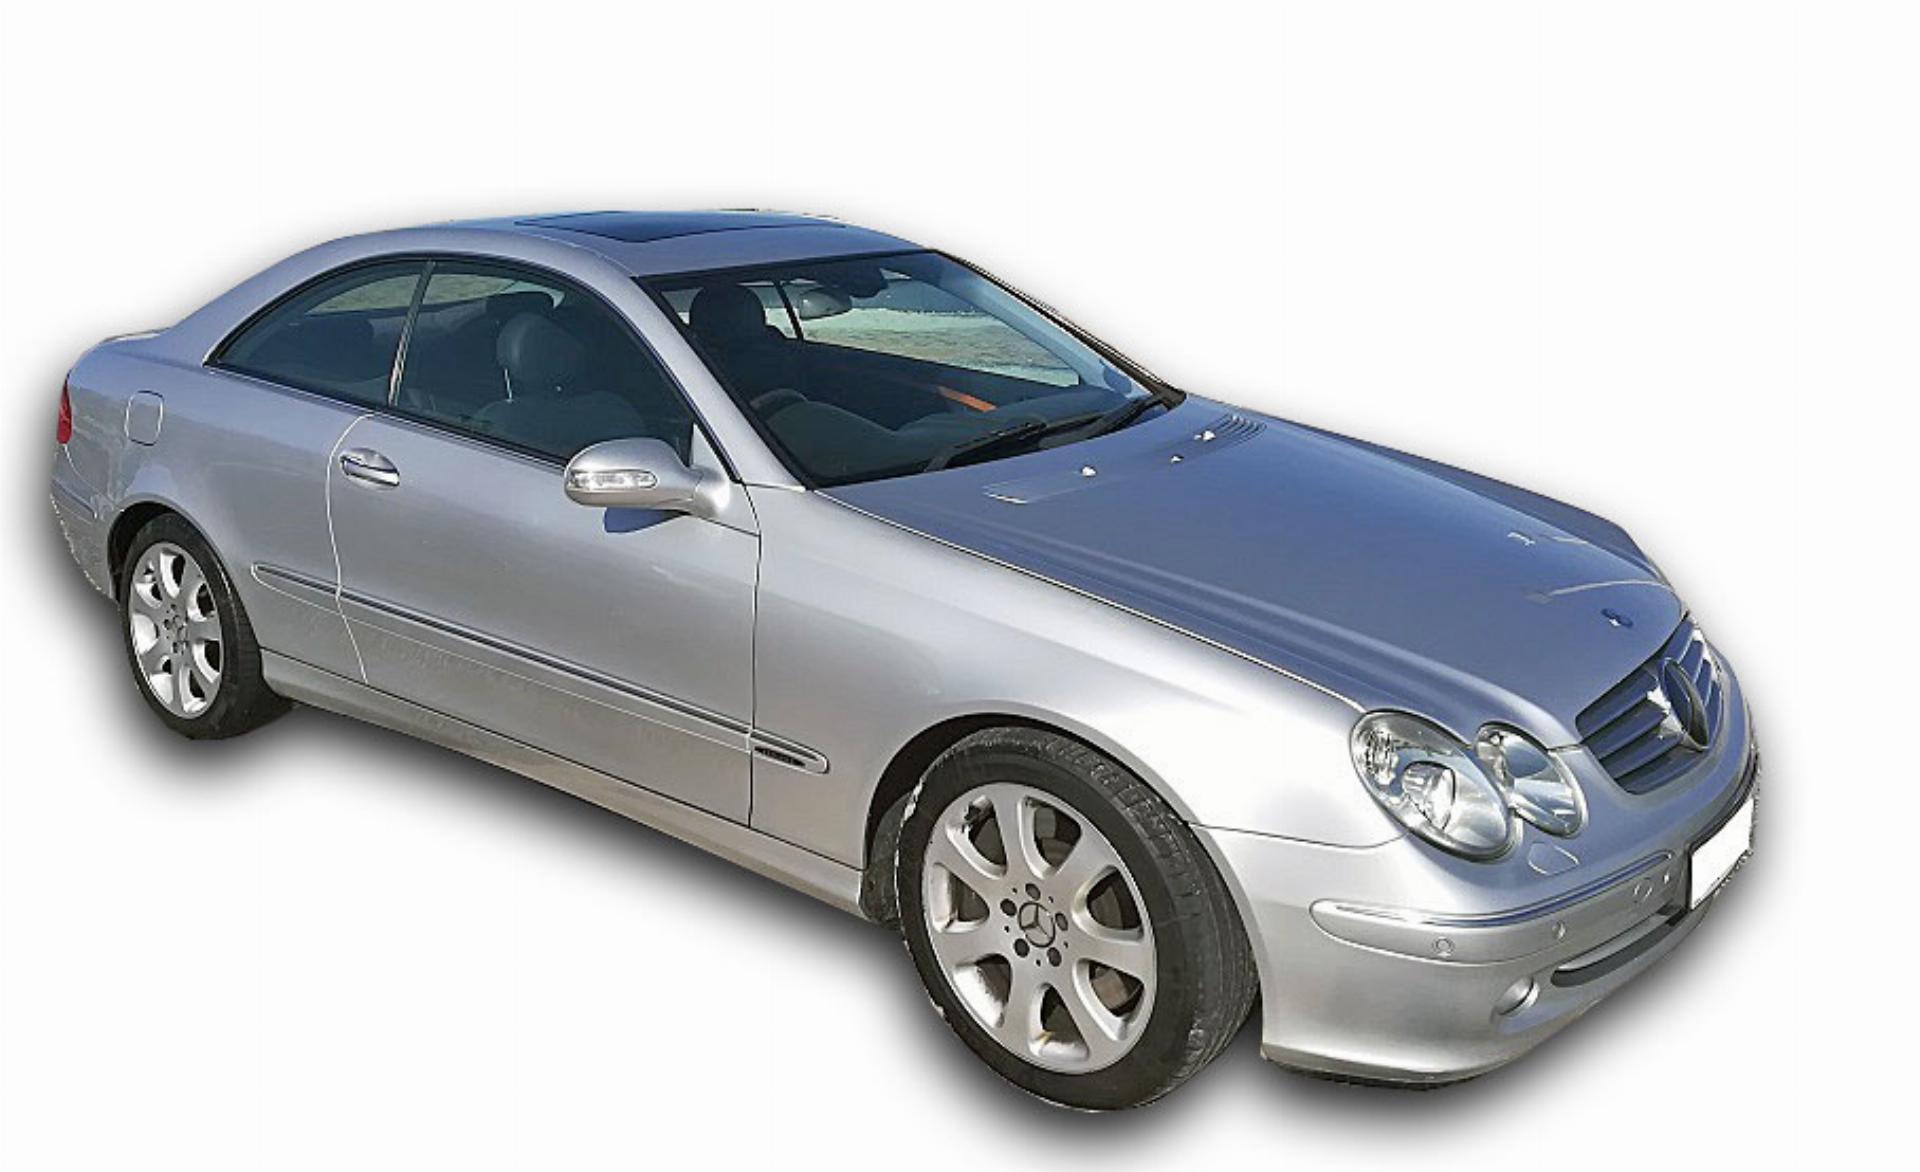 Mercedes Benz CLK 500 Elegance